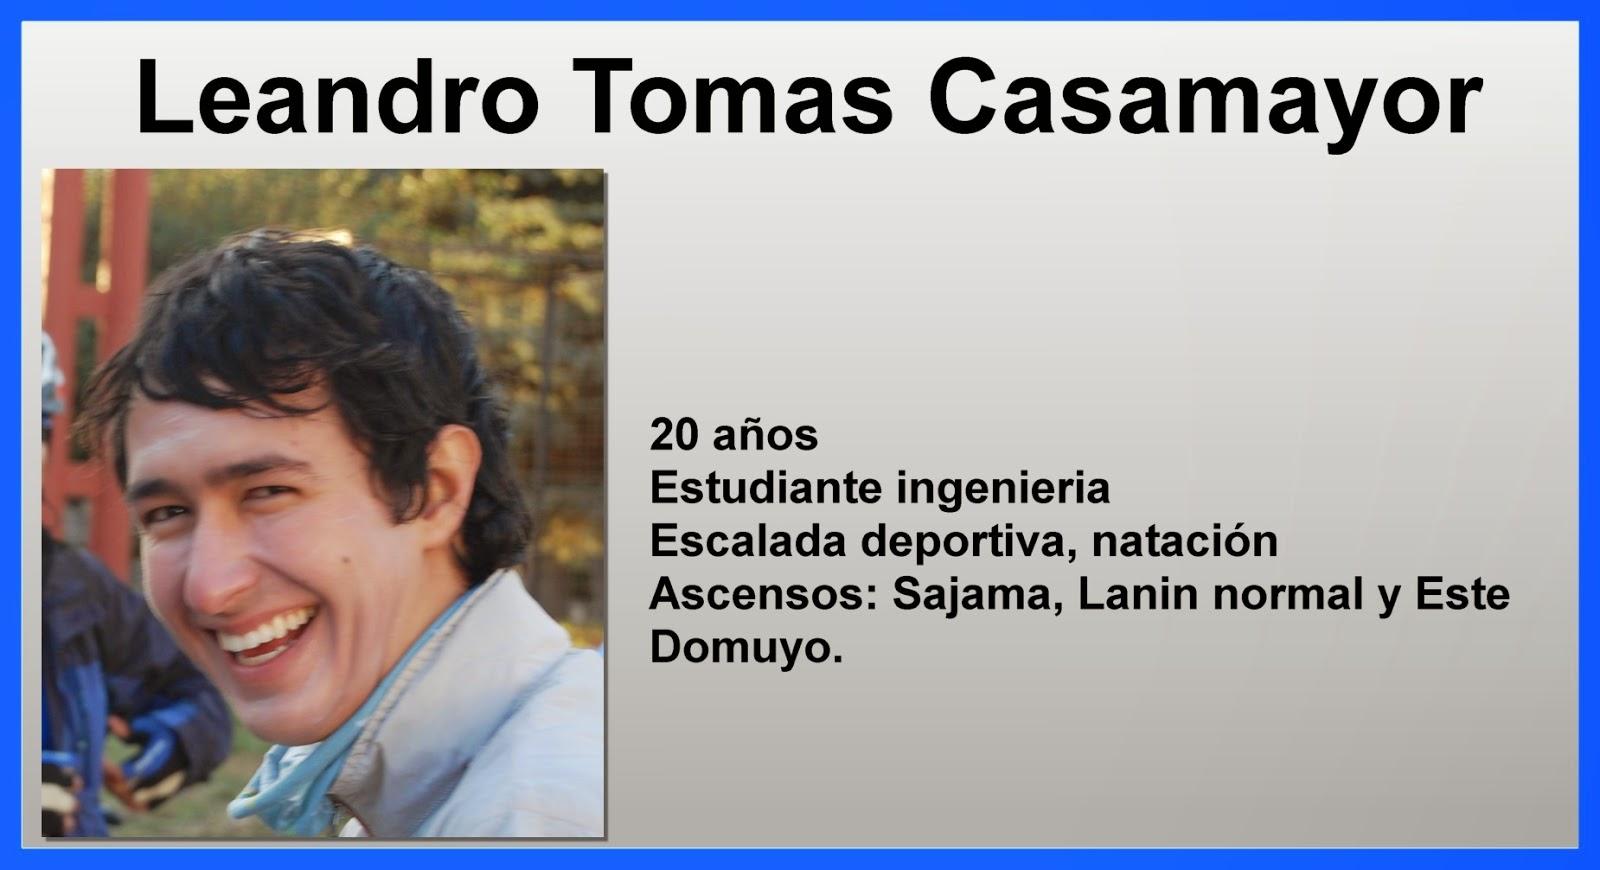 https://www.facebook.com/leandro.casamayor?fref=ts